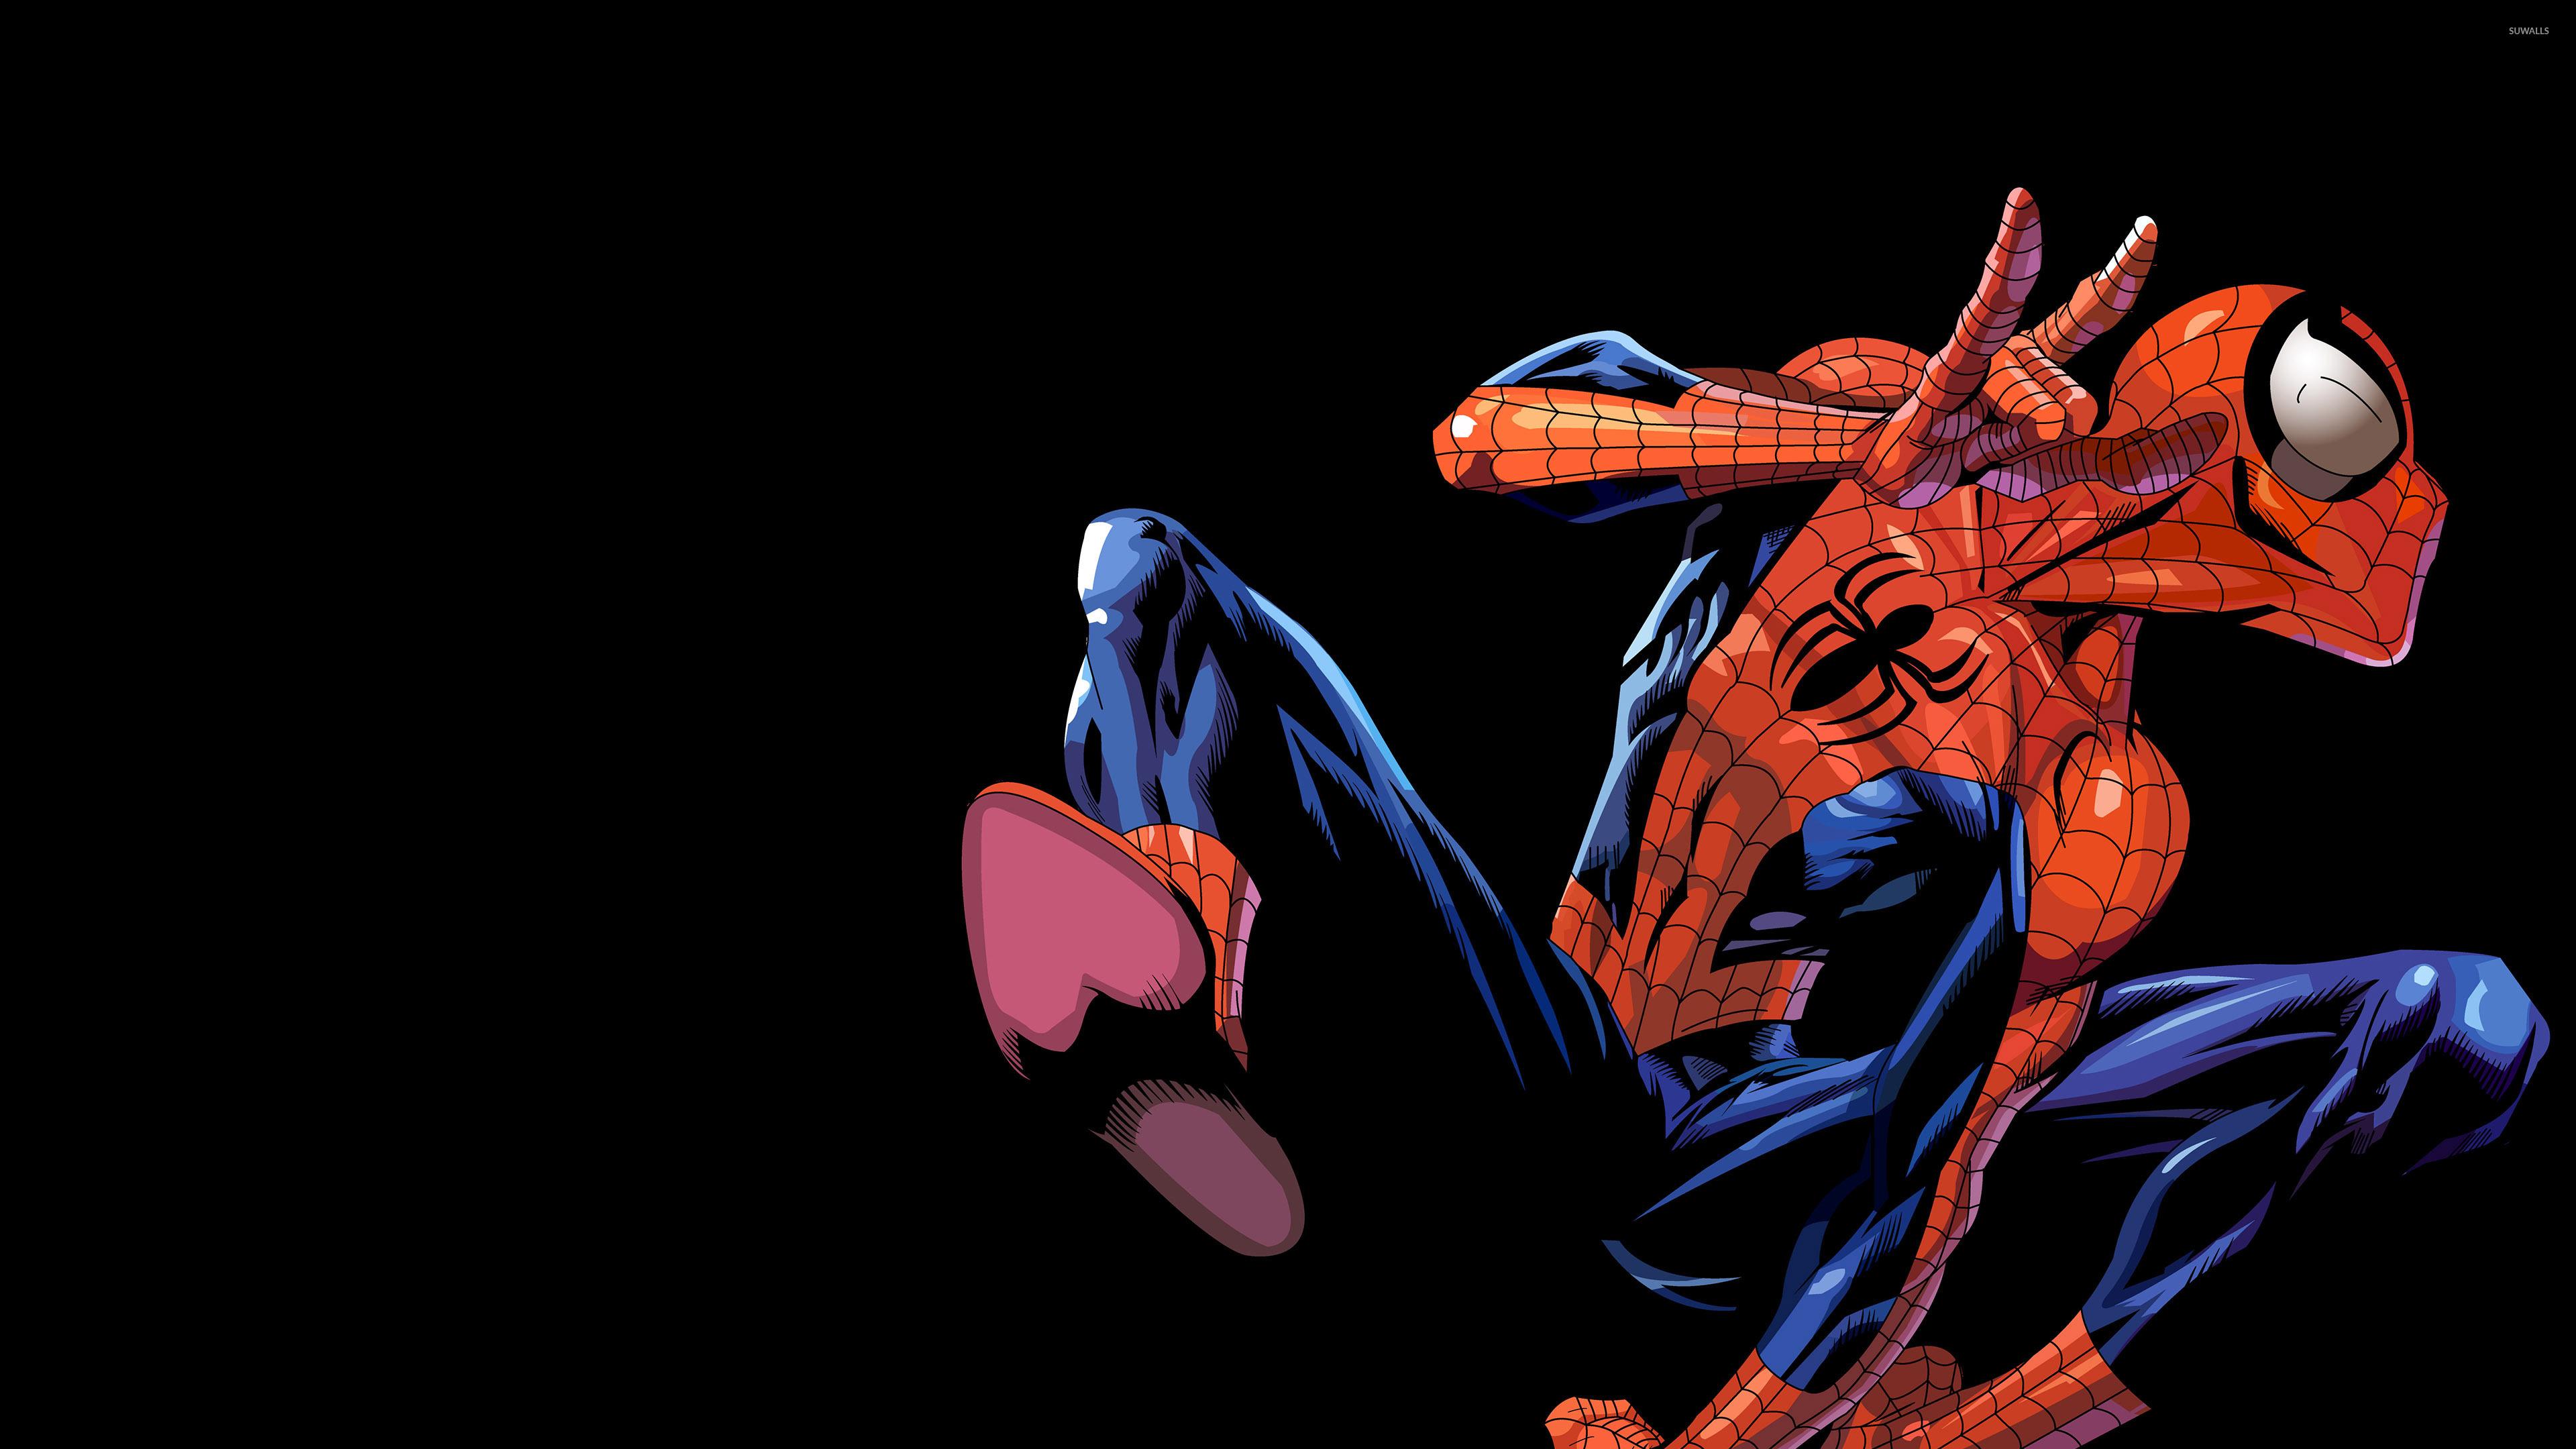 marvel comics wallpaper spider - photo #10